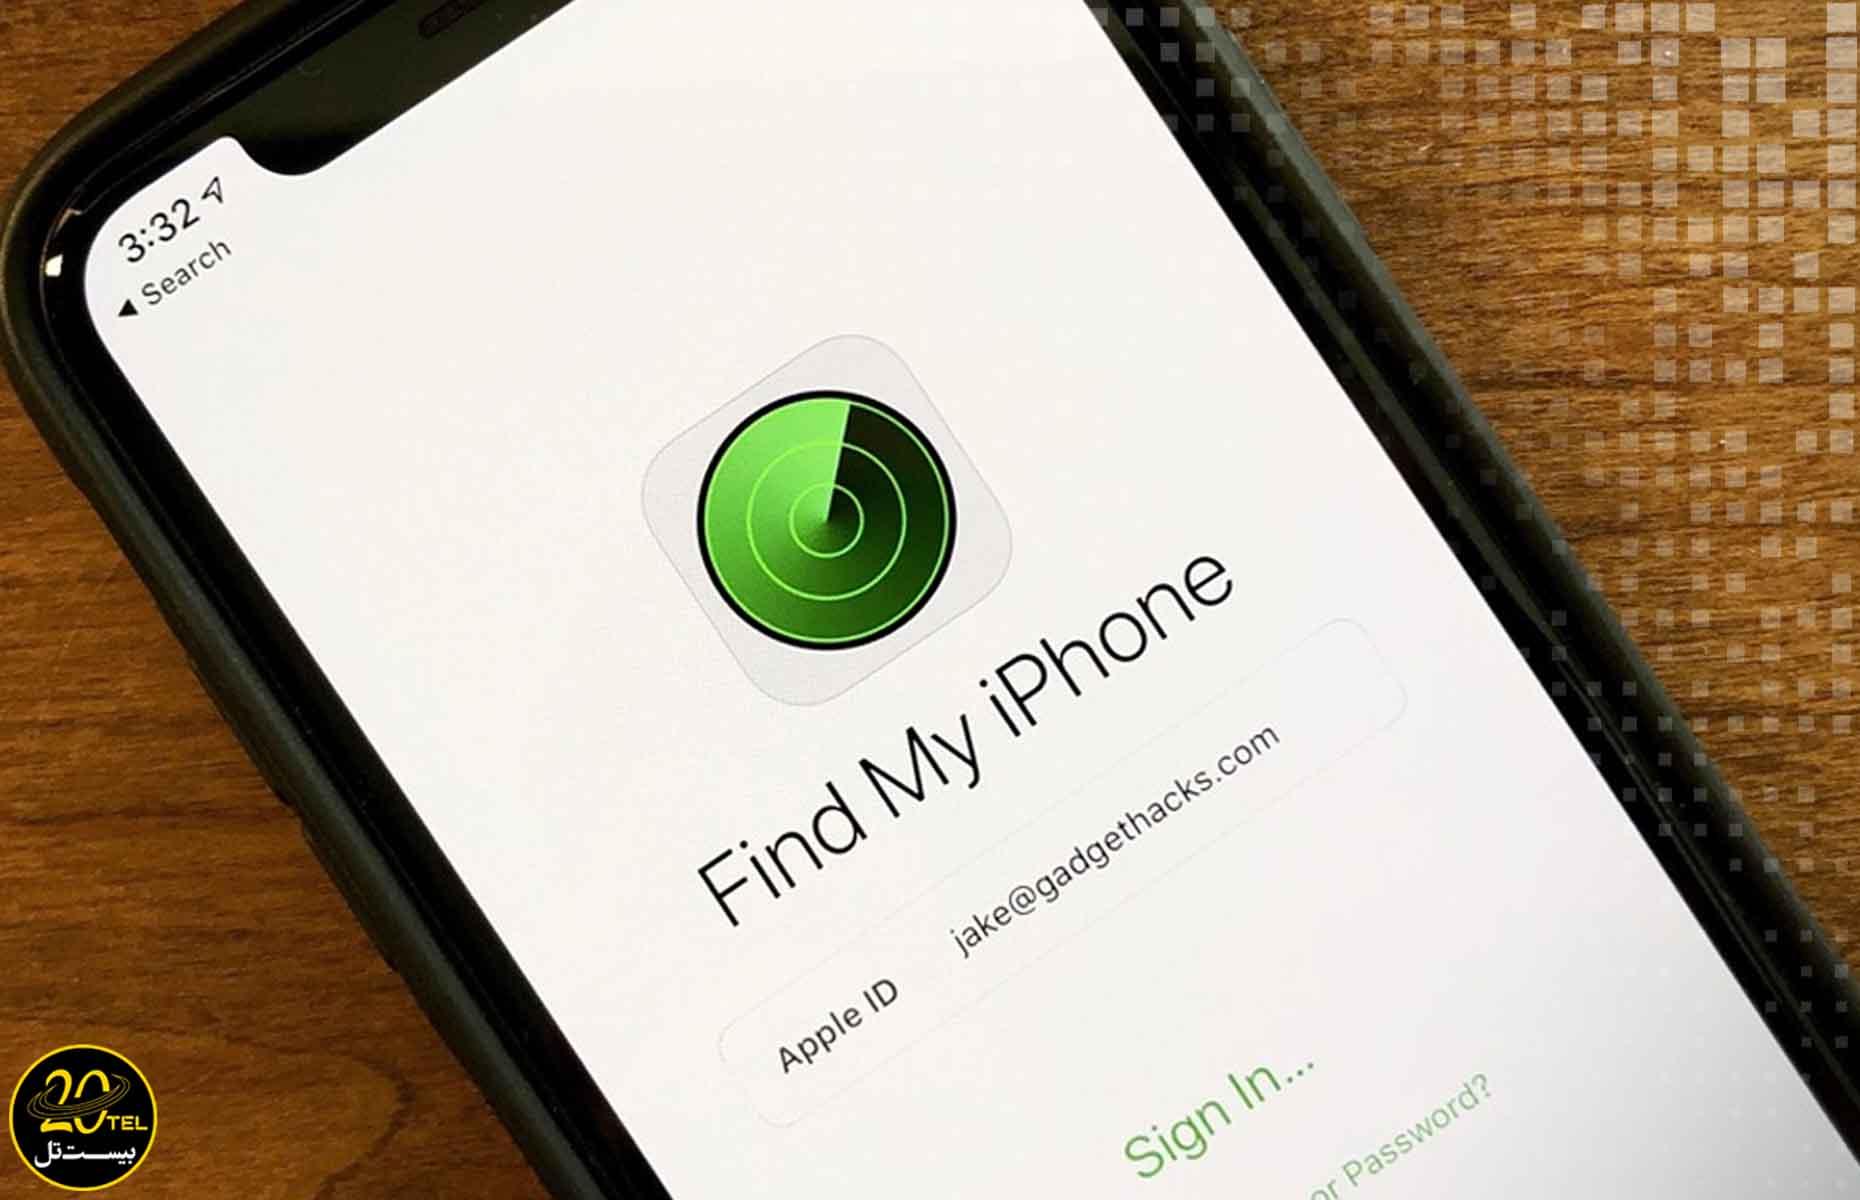 فعالسازی قابلیت Find My iPhone در اپل واچ- آیفون و مک بوک